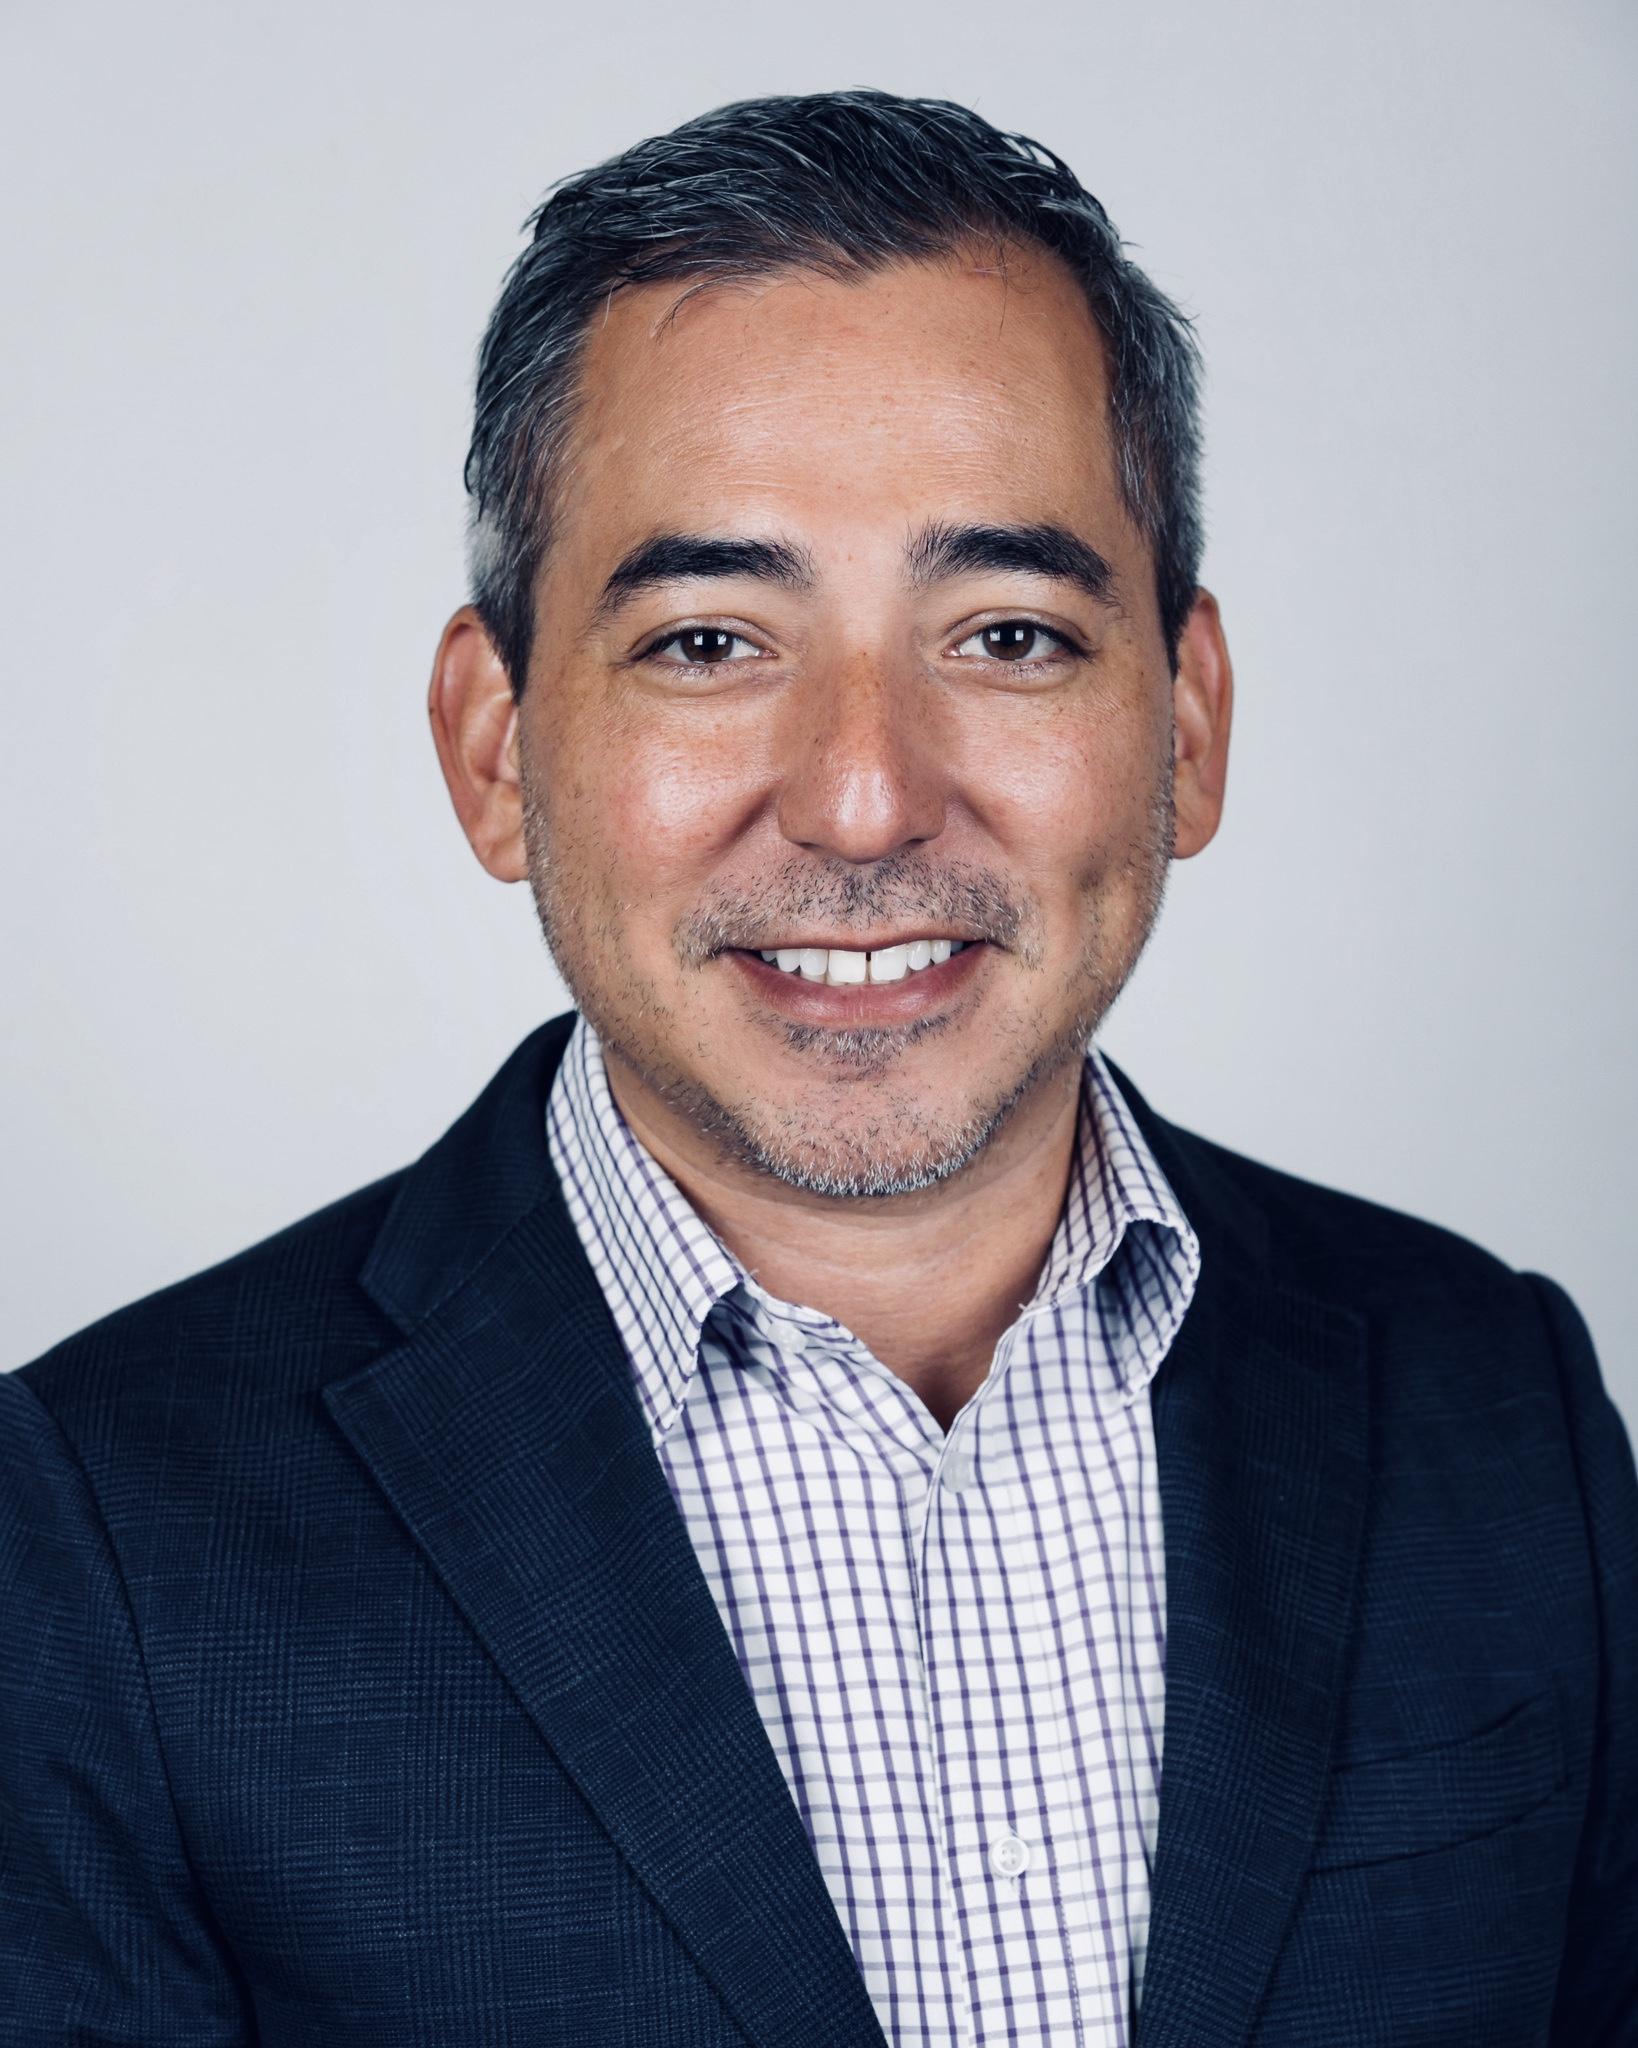 Norberto Salinas, Salinas Strategies, Washing DC Government Relations Advocacy